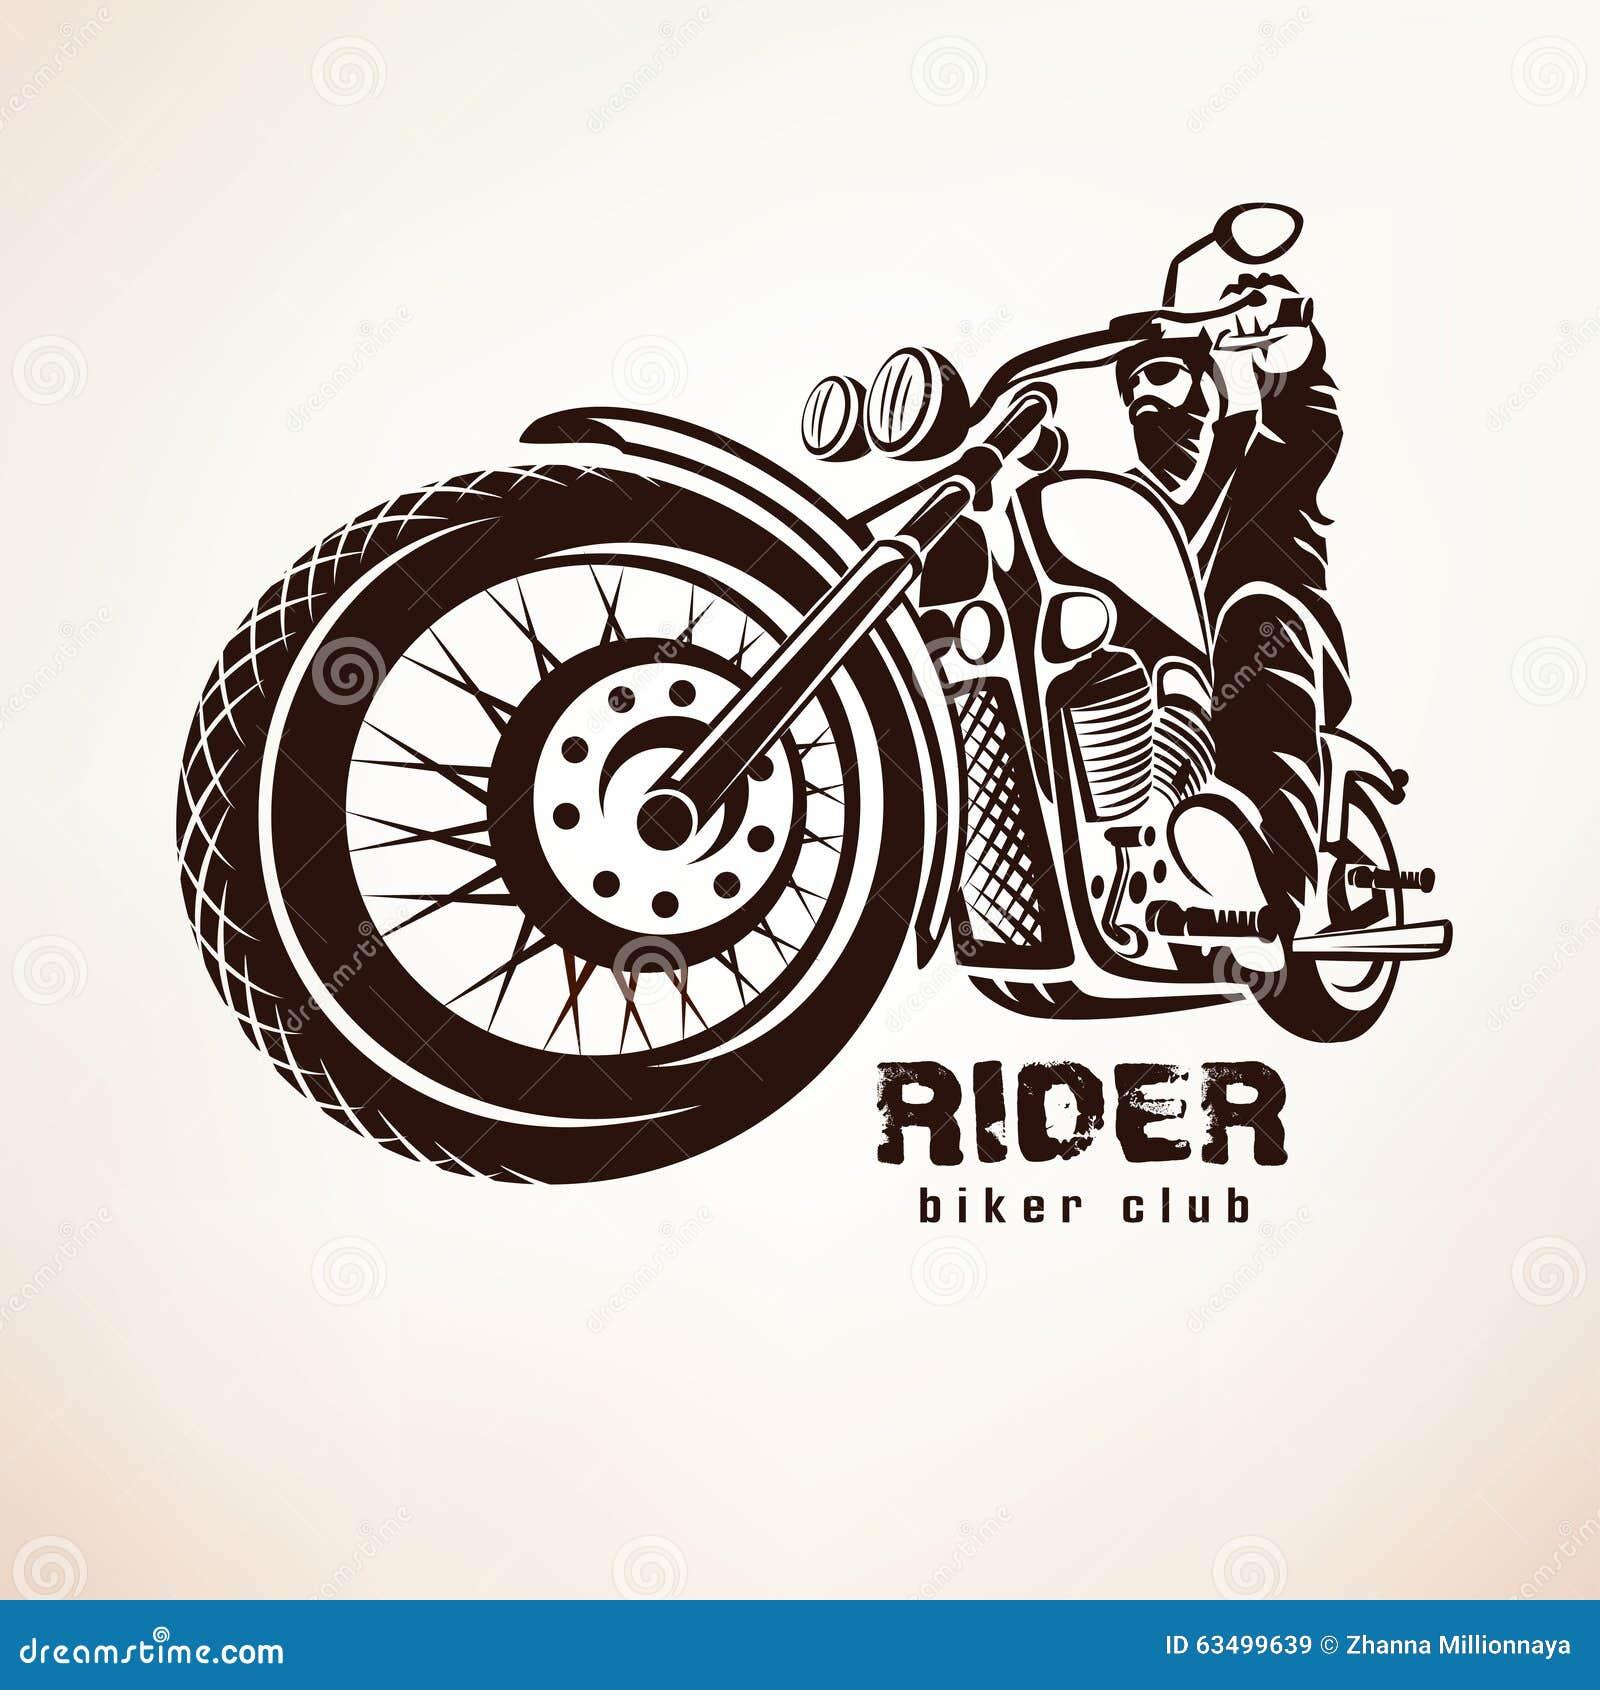 Motociclista, silhueta do vetor do grunge da motocicleta